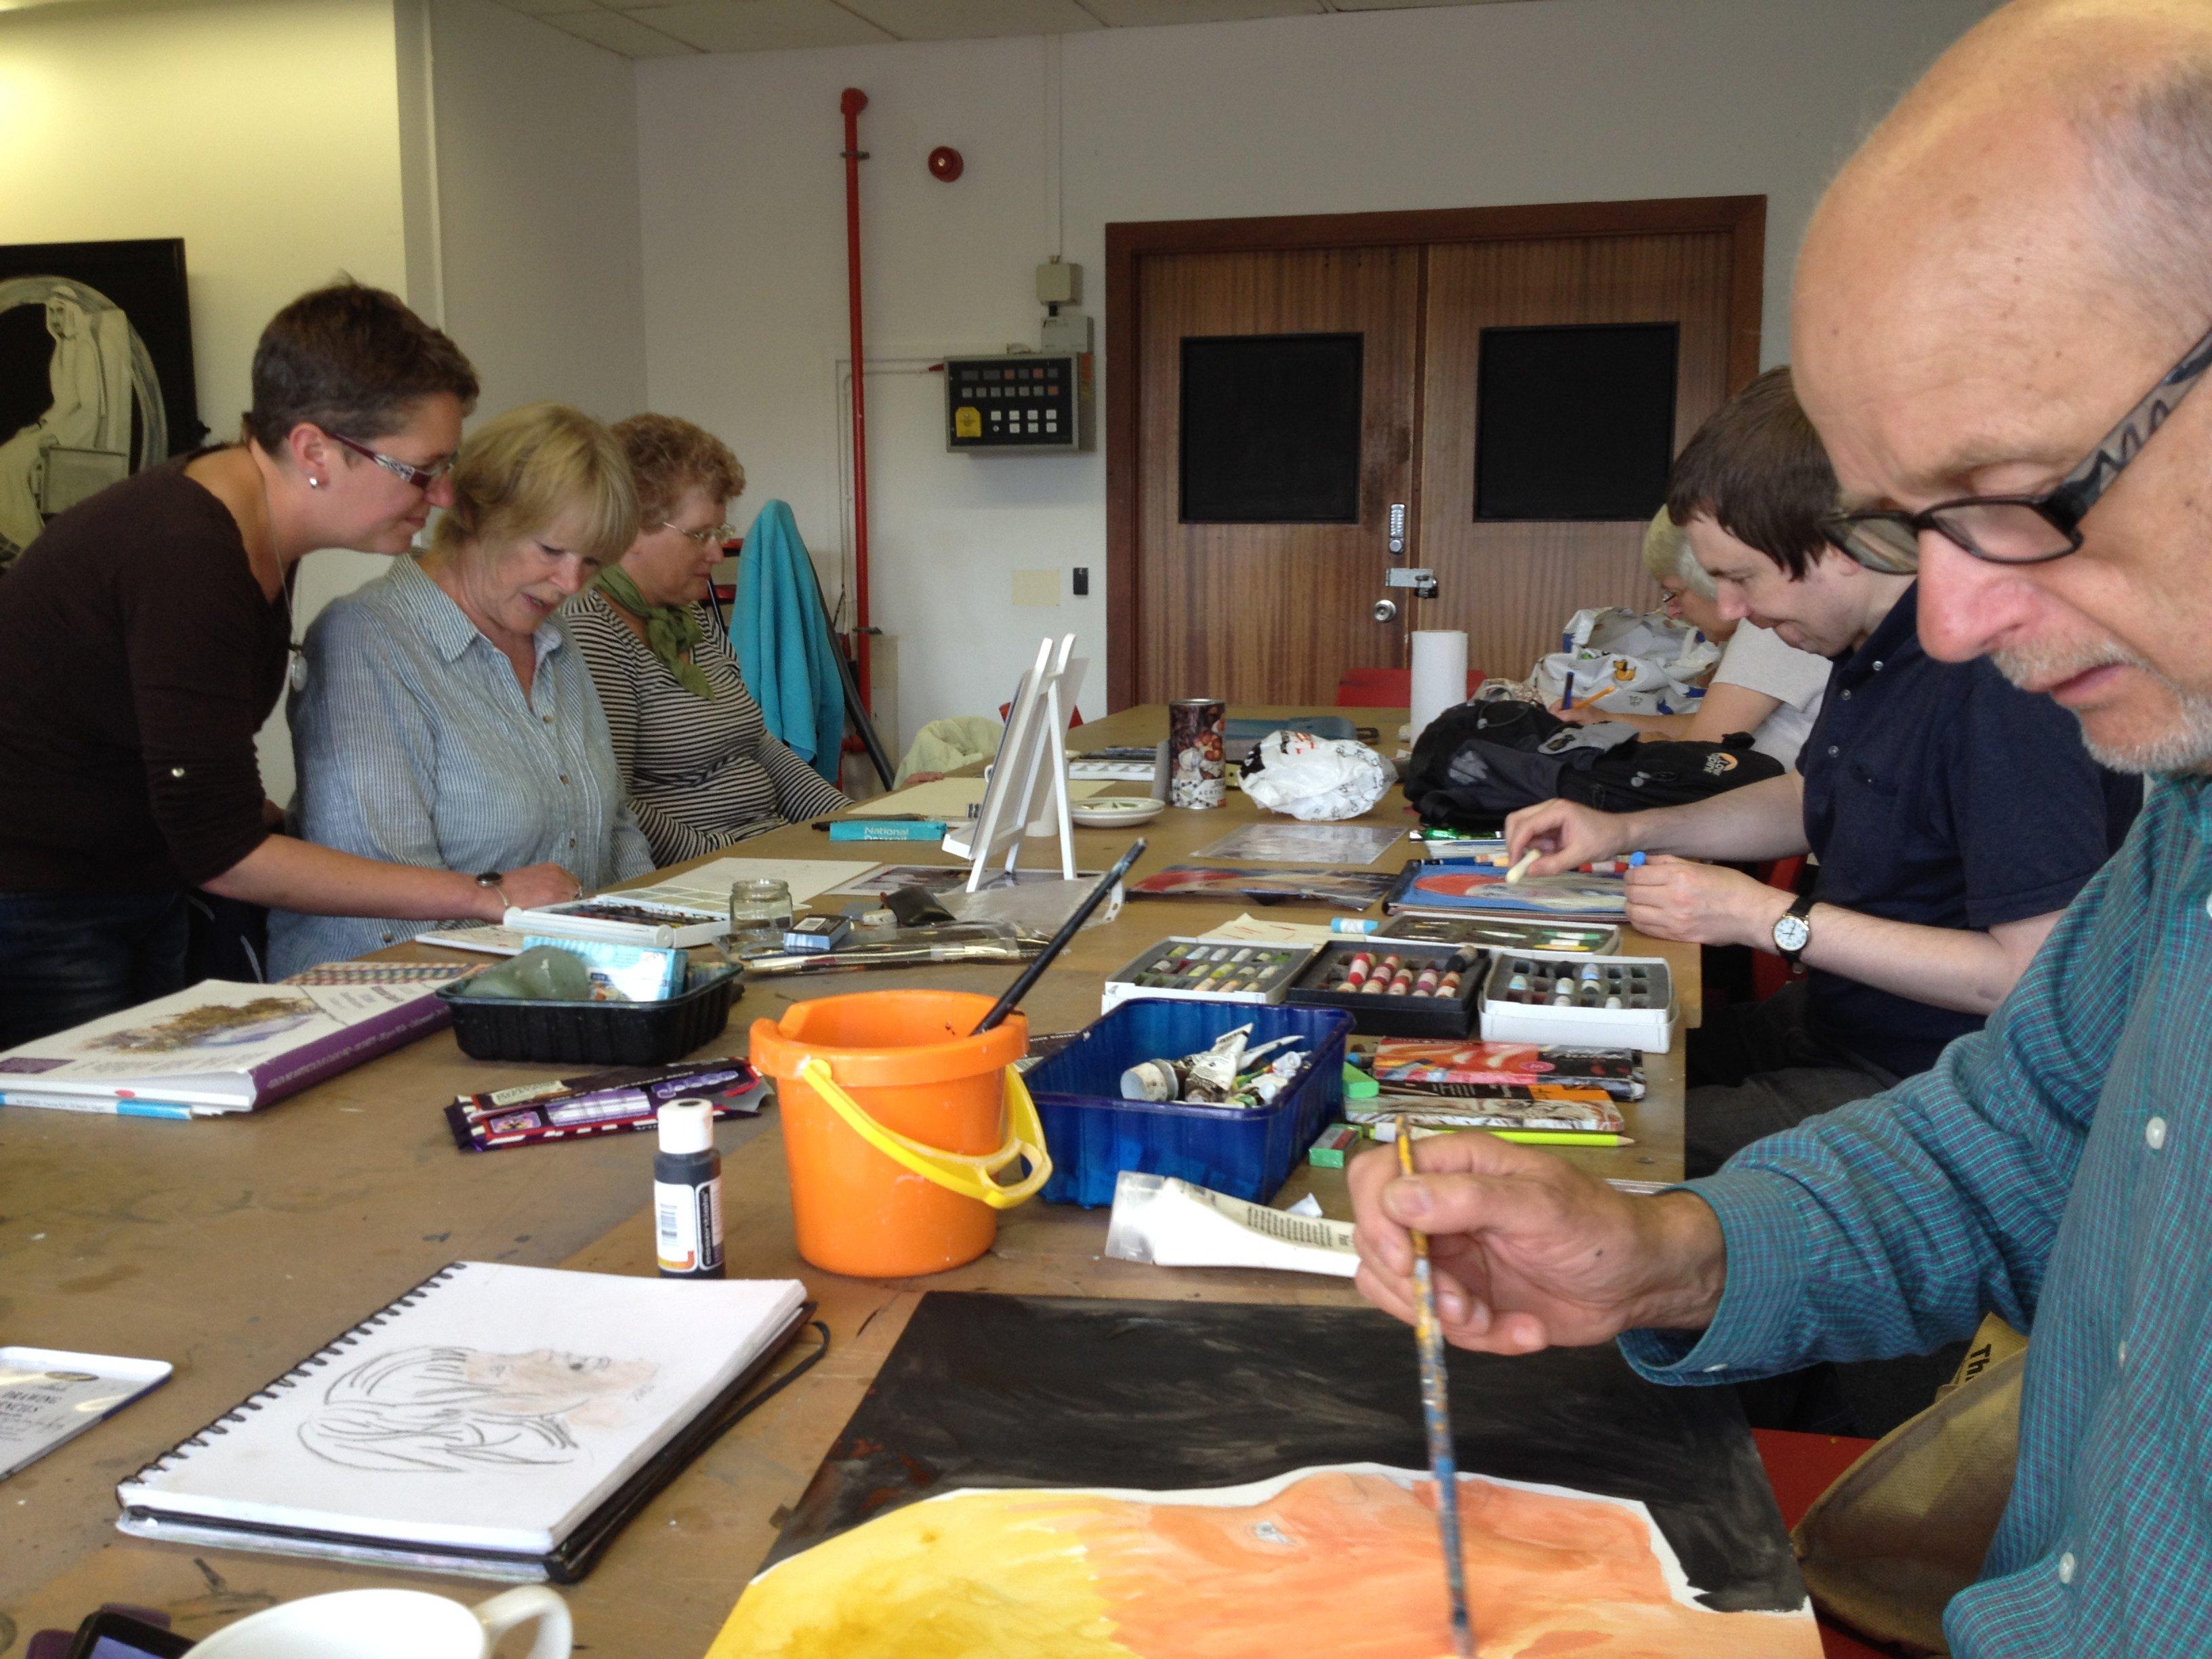 Explore lifelong learning 2016 art workshop tutor Cecilia Holmes adult education